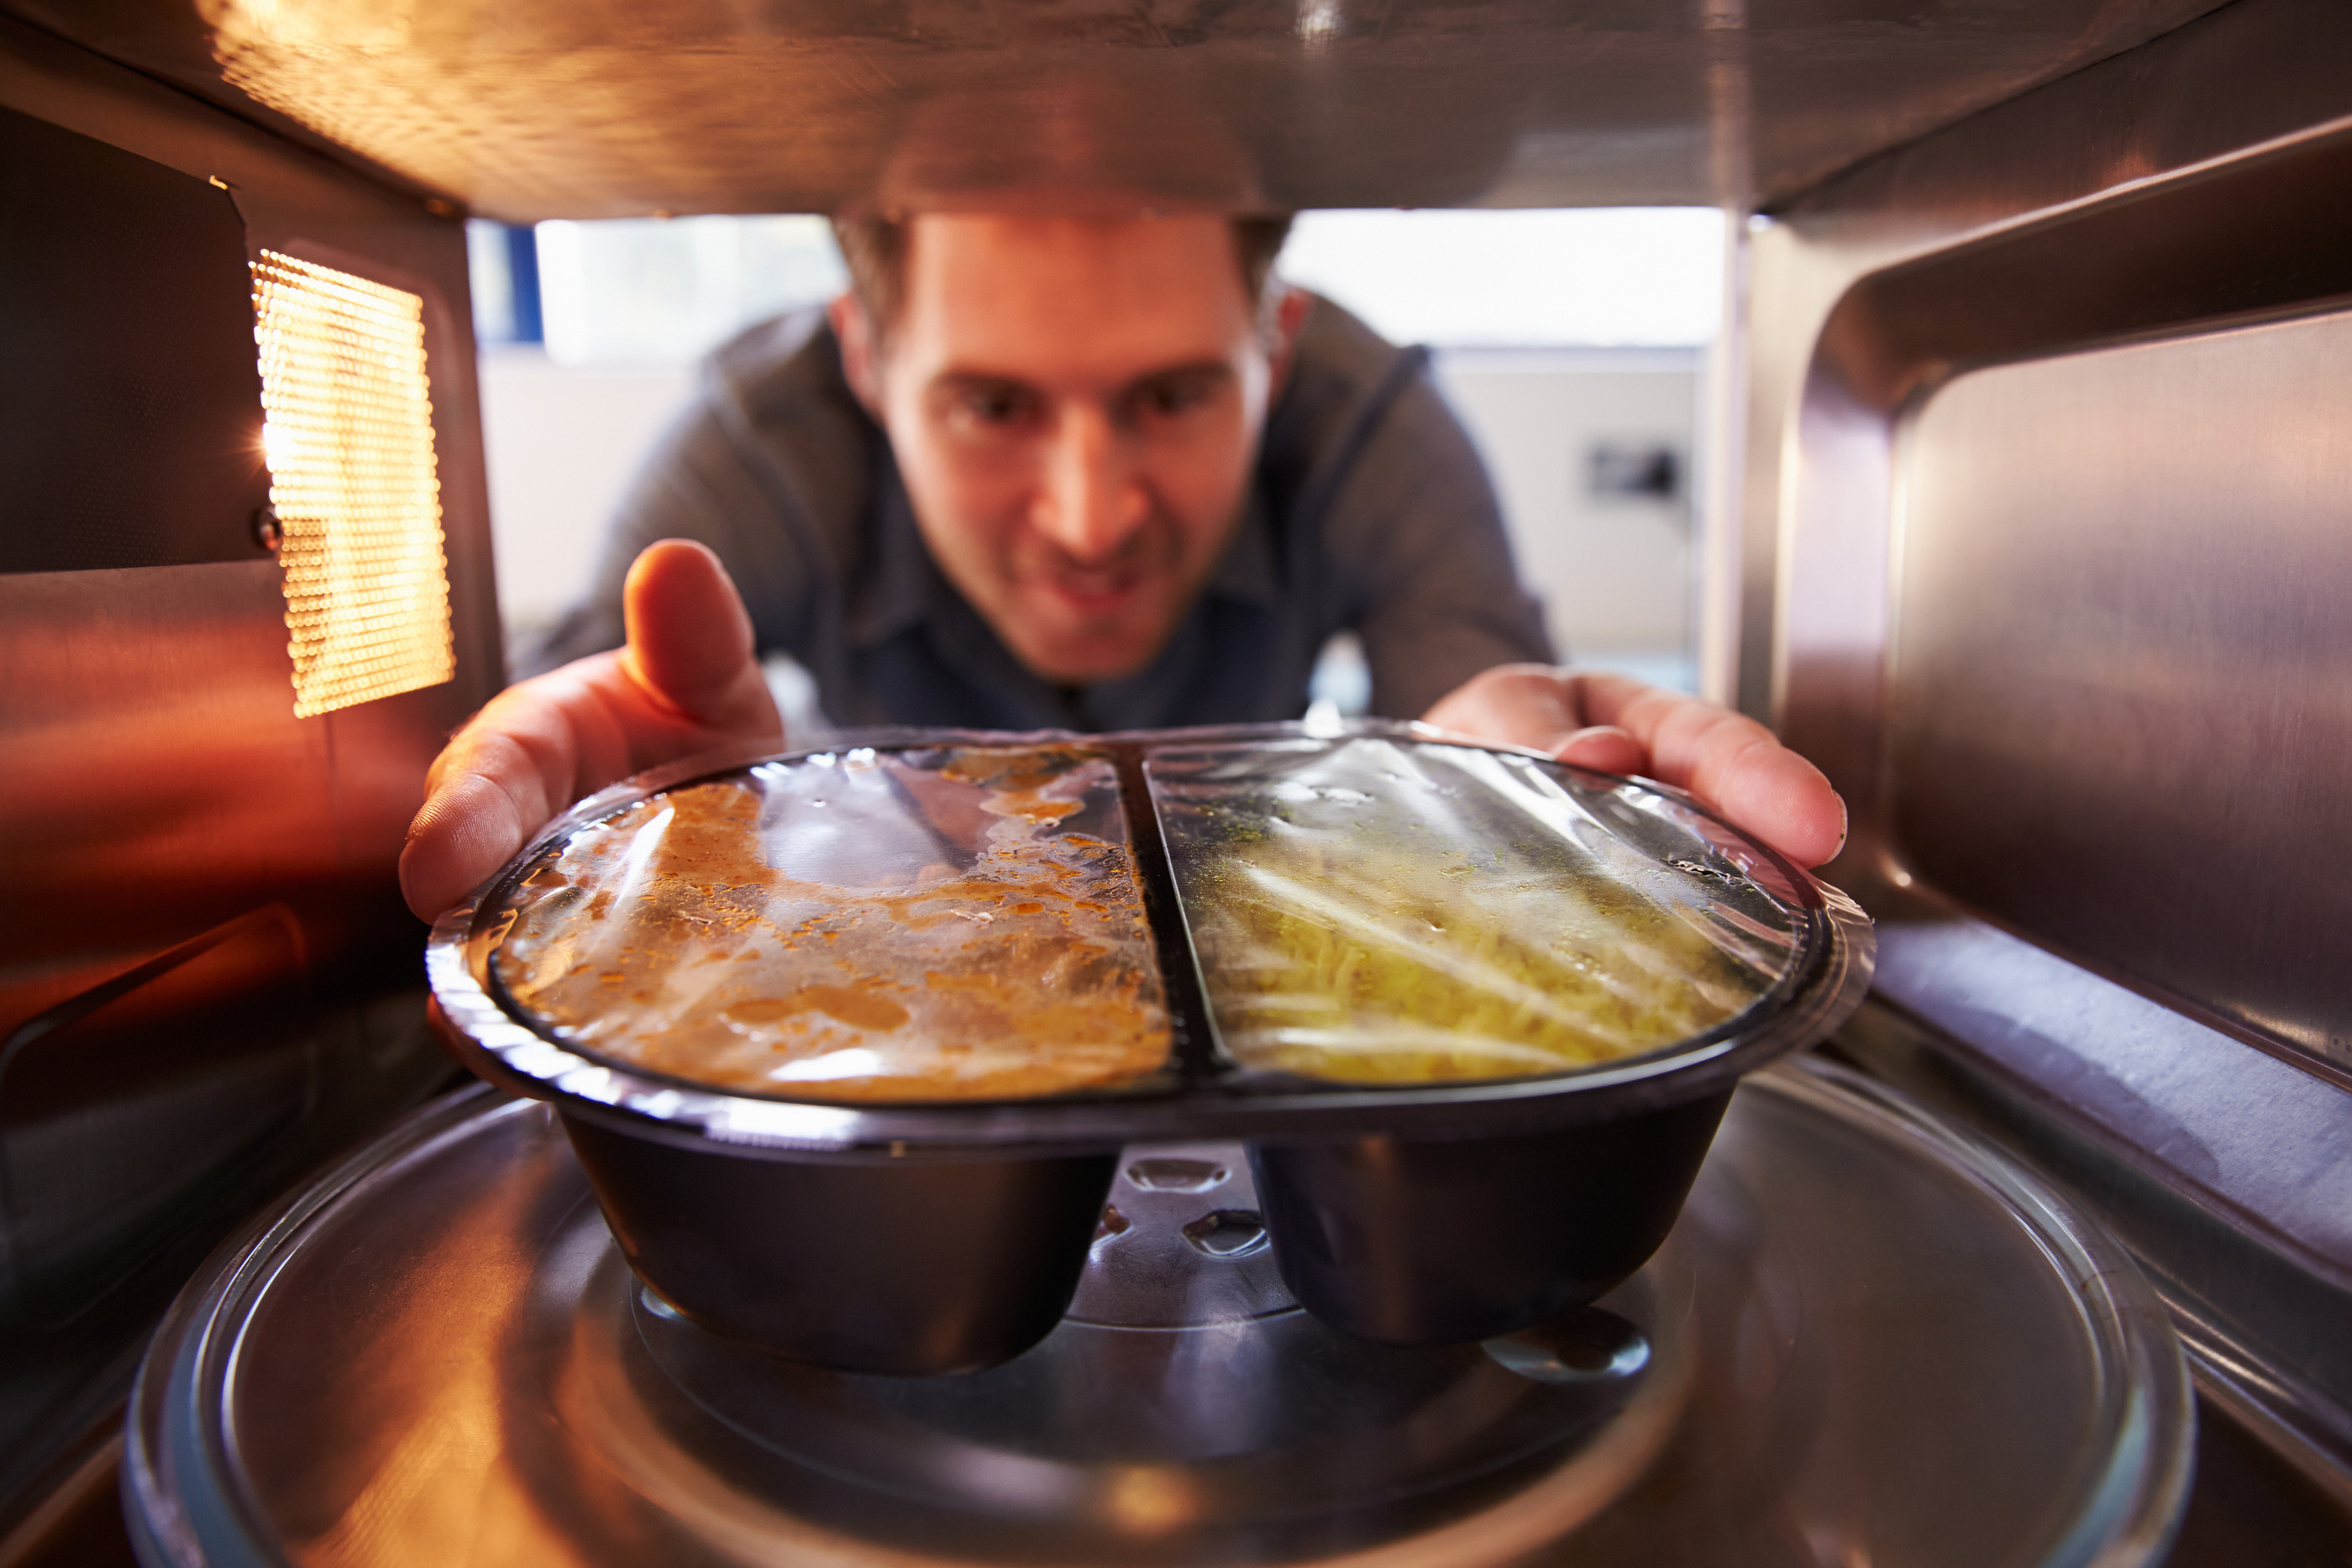 bigstock-Man-microwave-Dinner-Into-Mic-77372021